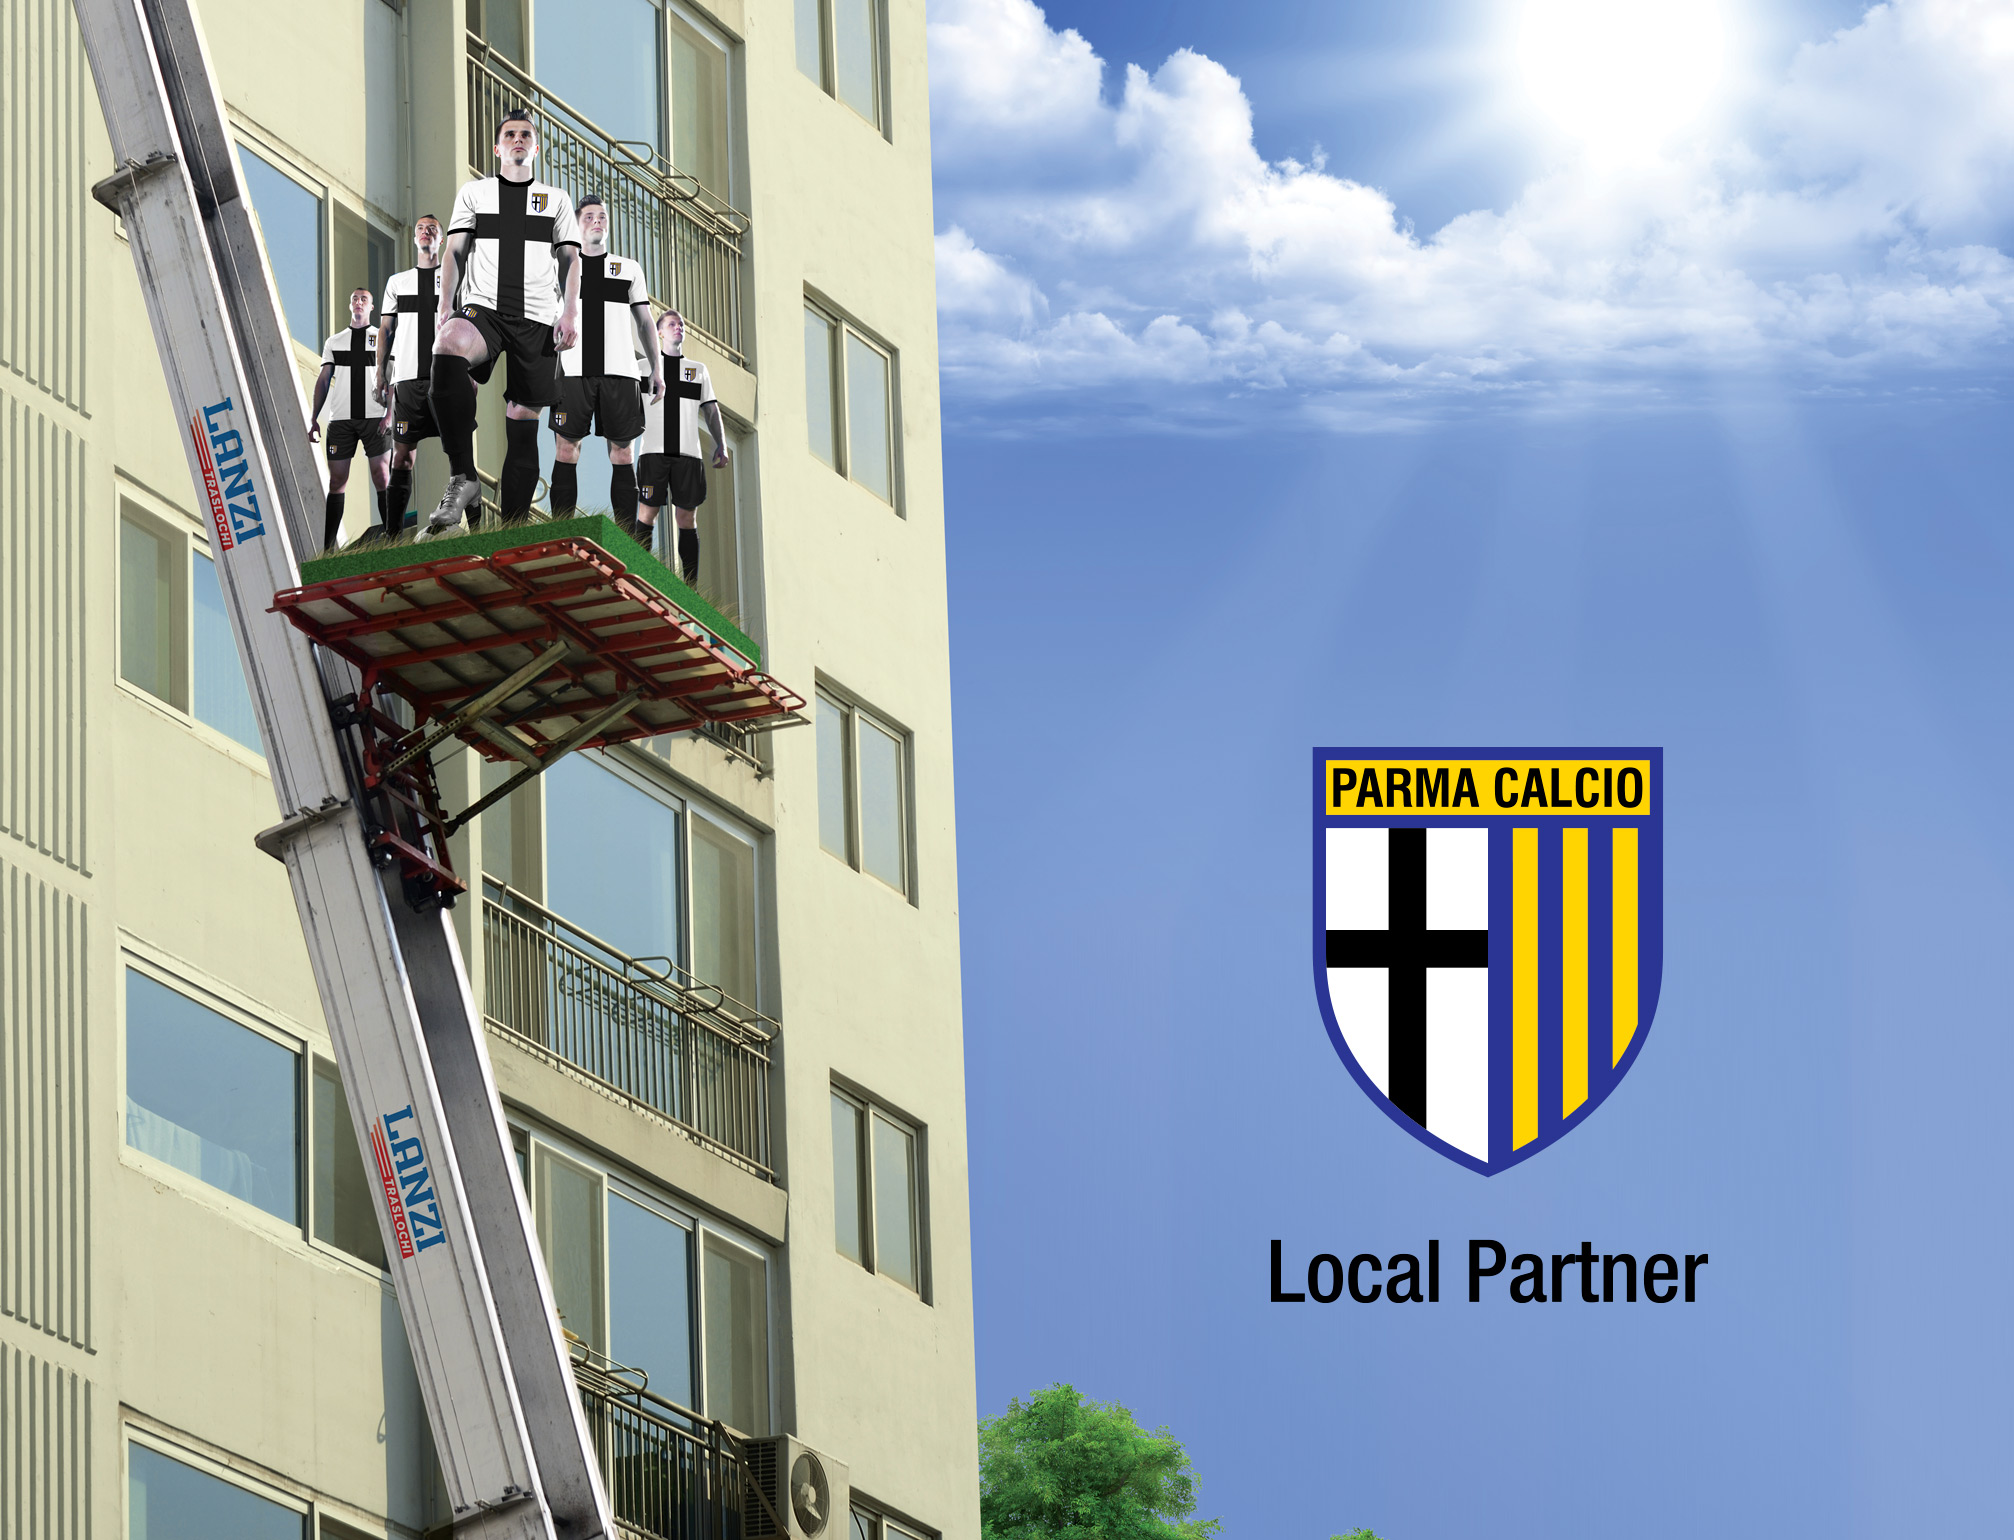 Lanzi News Adv Local Partner Parma Calcio